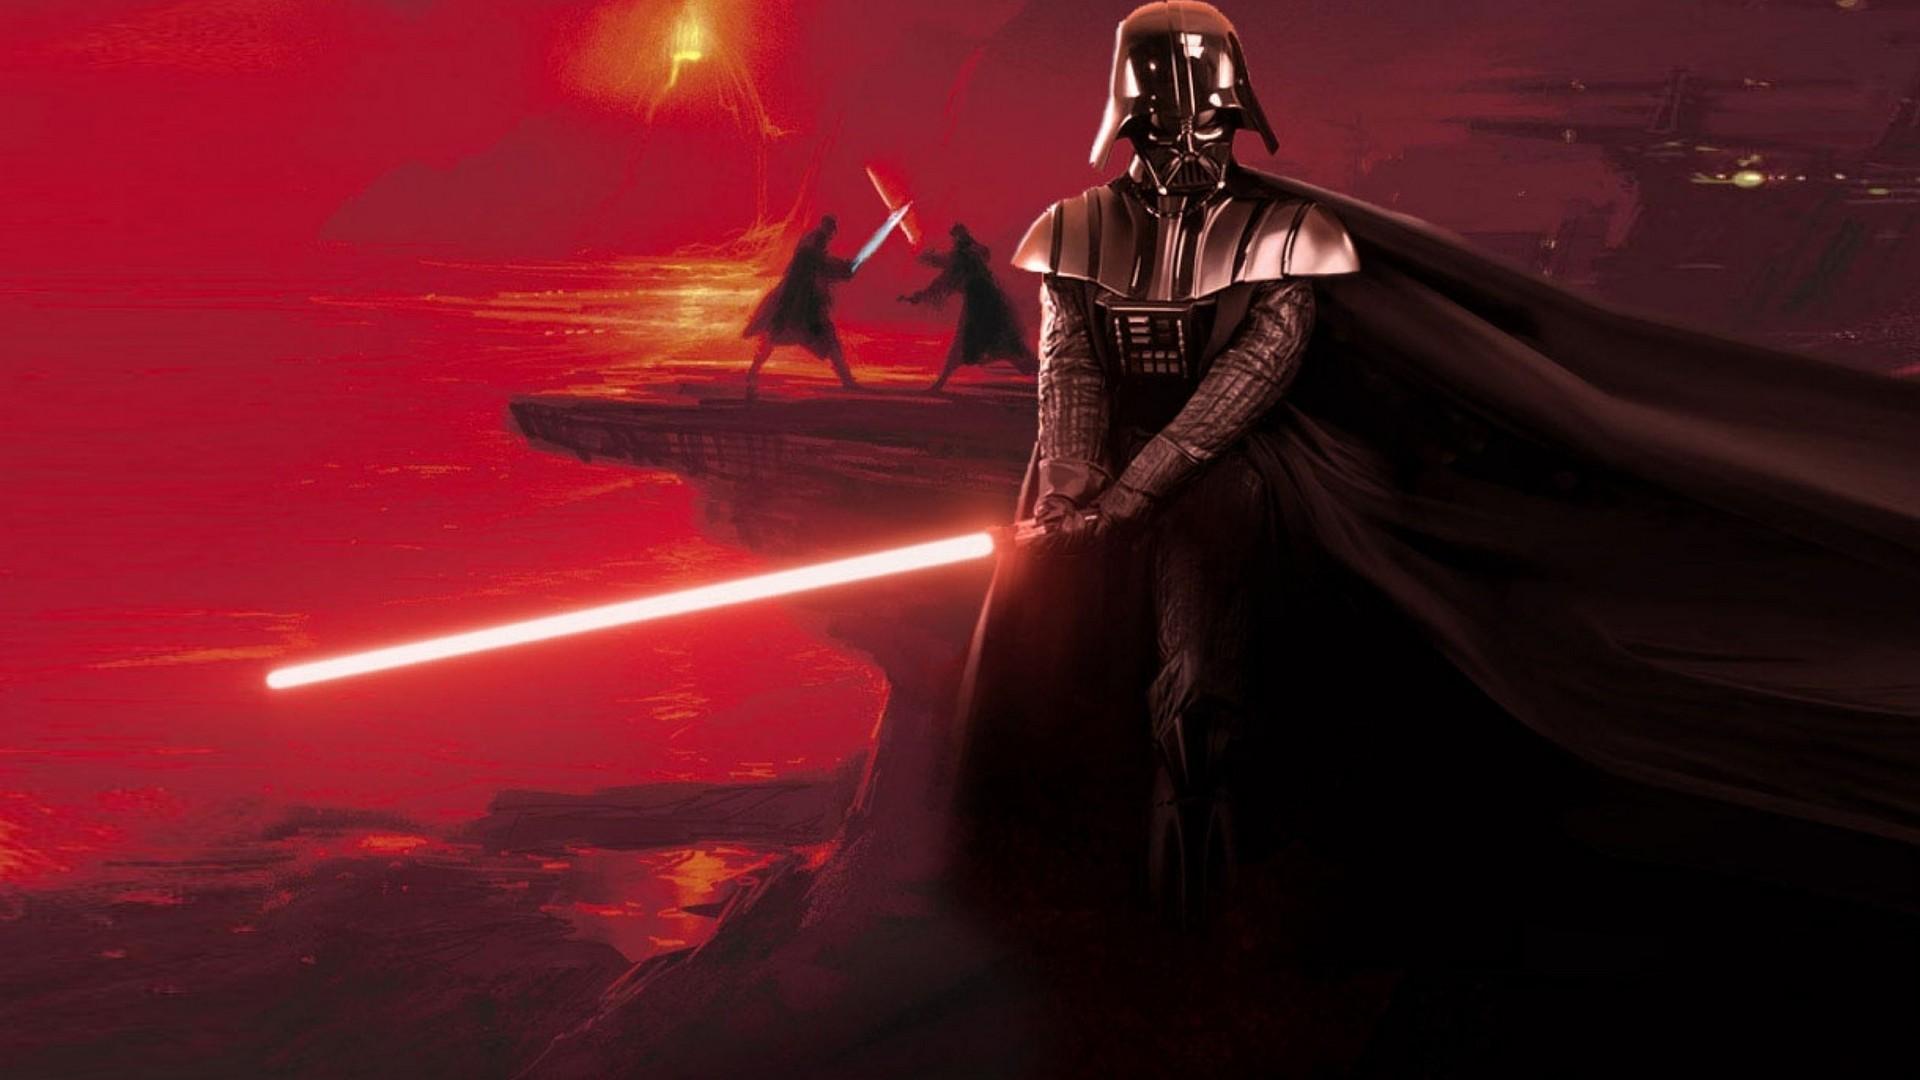 Res: 1920x1080, Star Wars Darth Vader Sith Lava Lightsabers Wallpaper HD